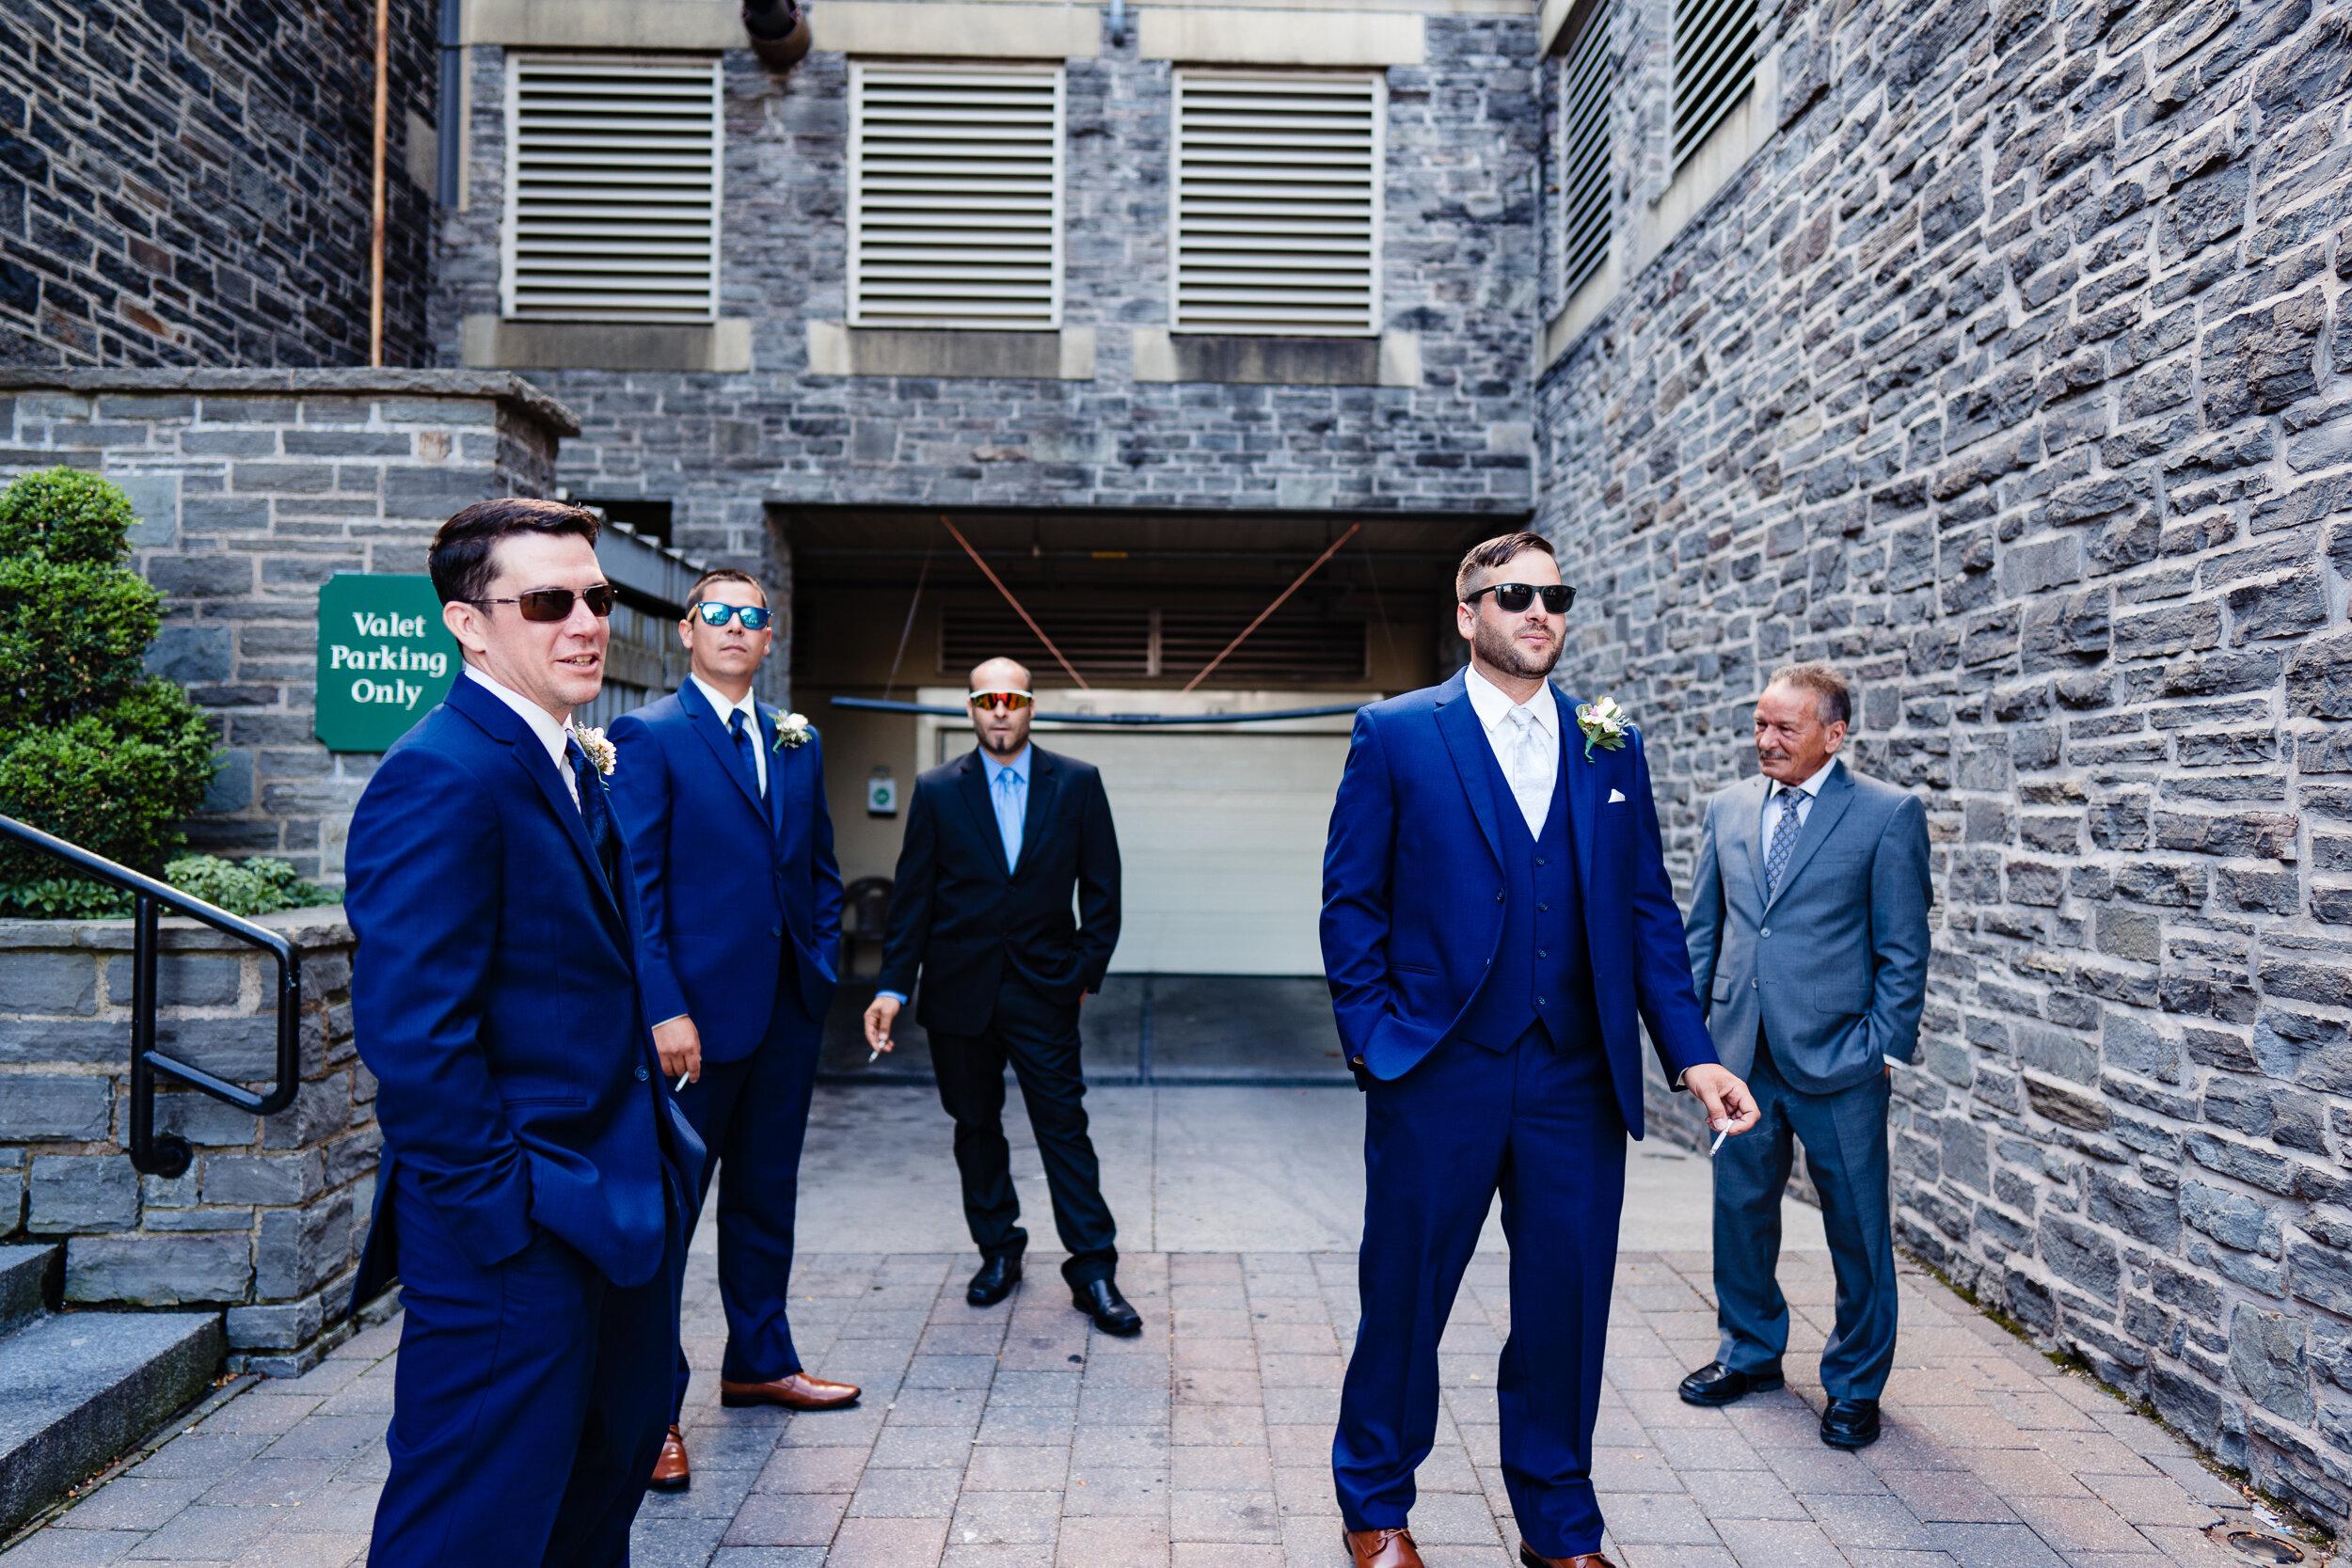 courtyard-marriot-wedding-halifax-2.jpg